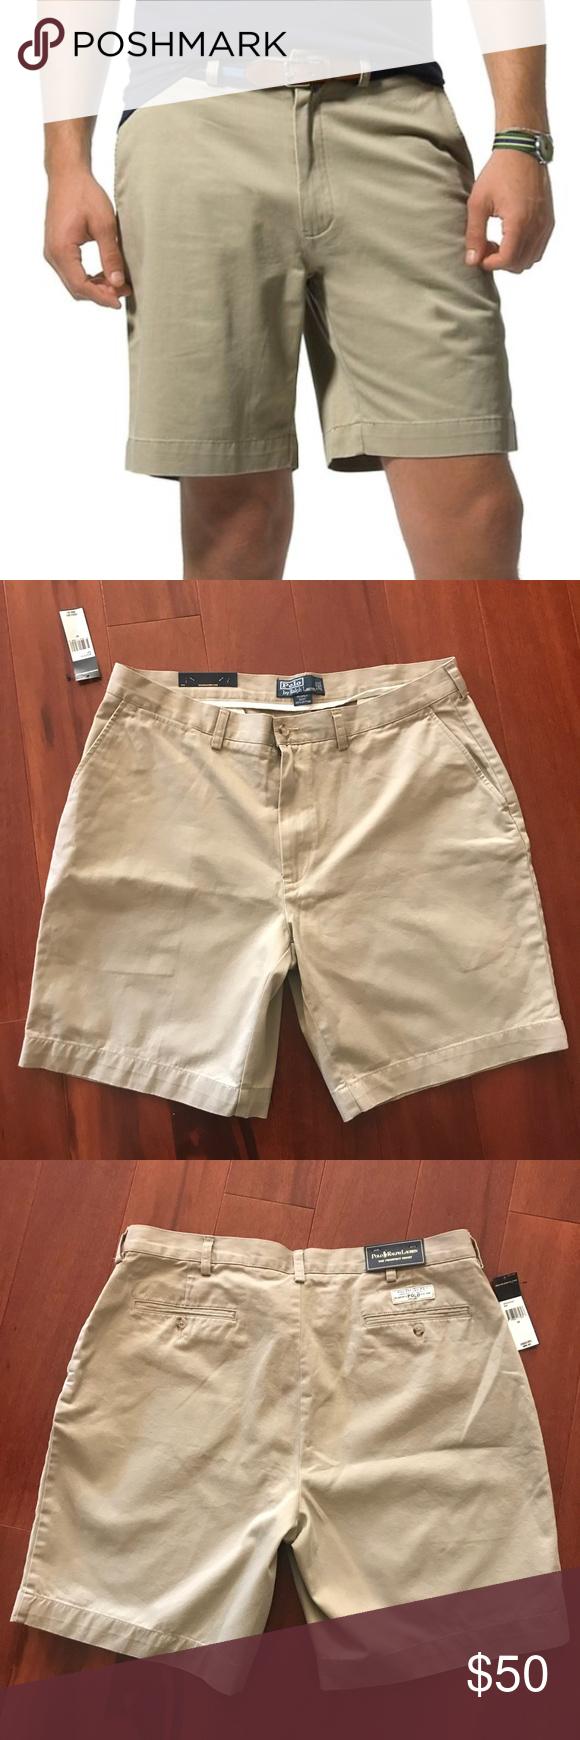 Ralph Men's Polo Shorts By Prospect Lauren Nwt Khaki j5AR4L